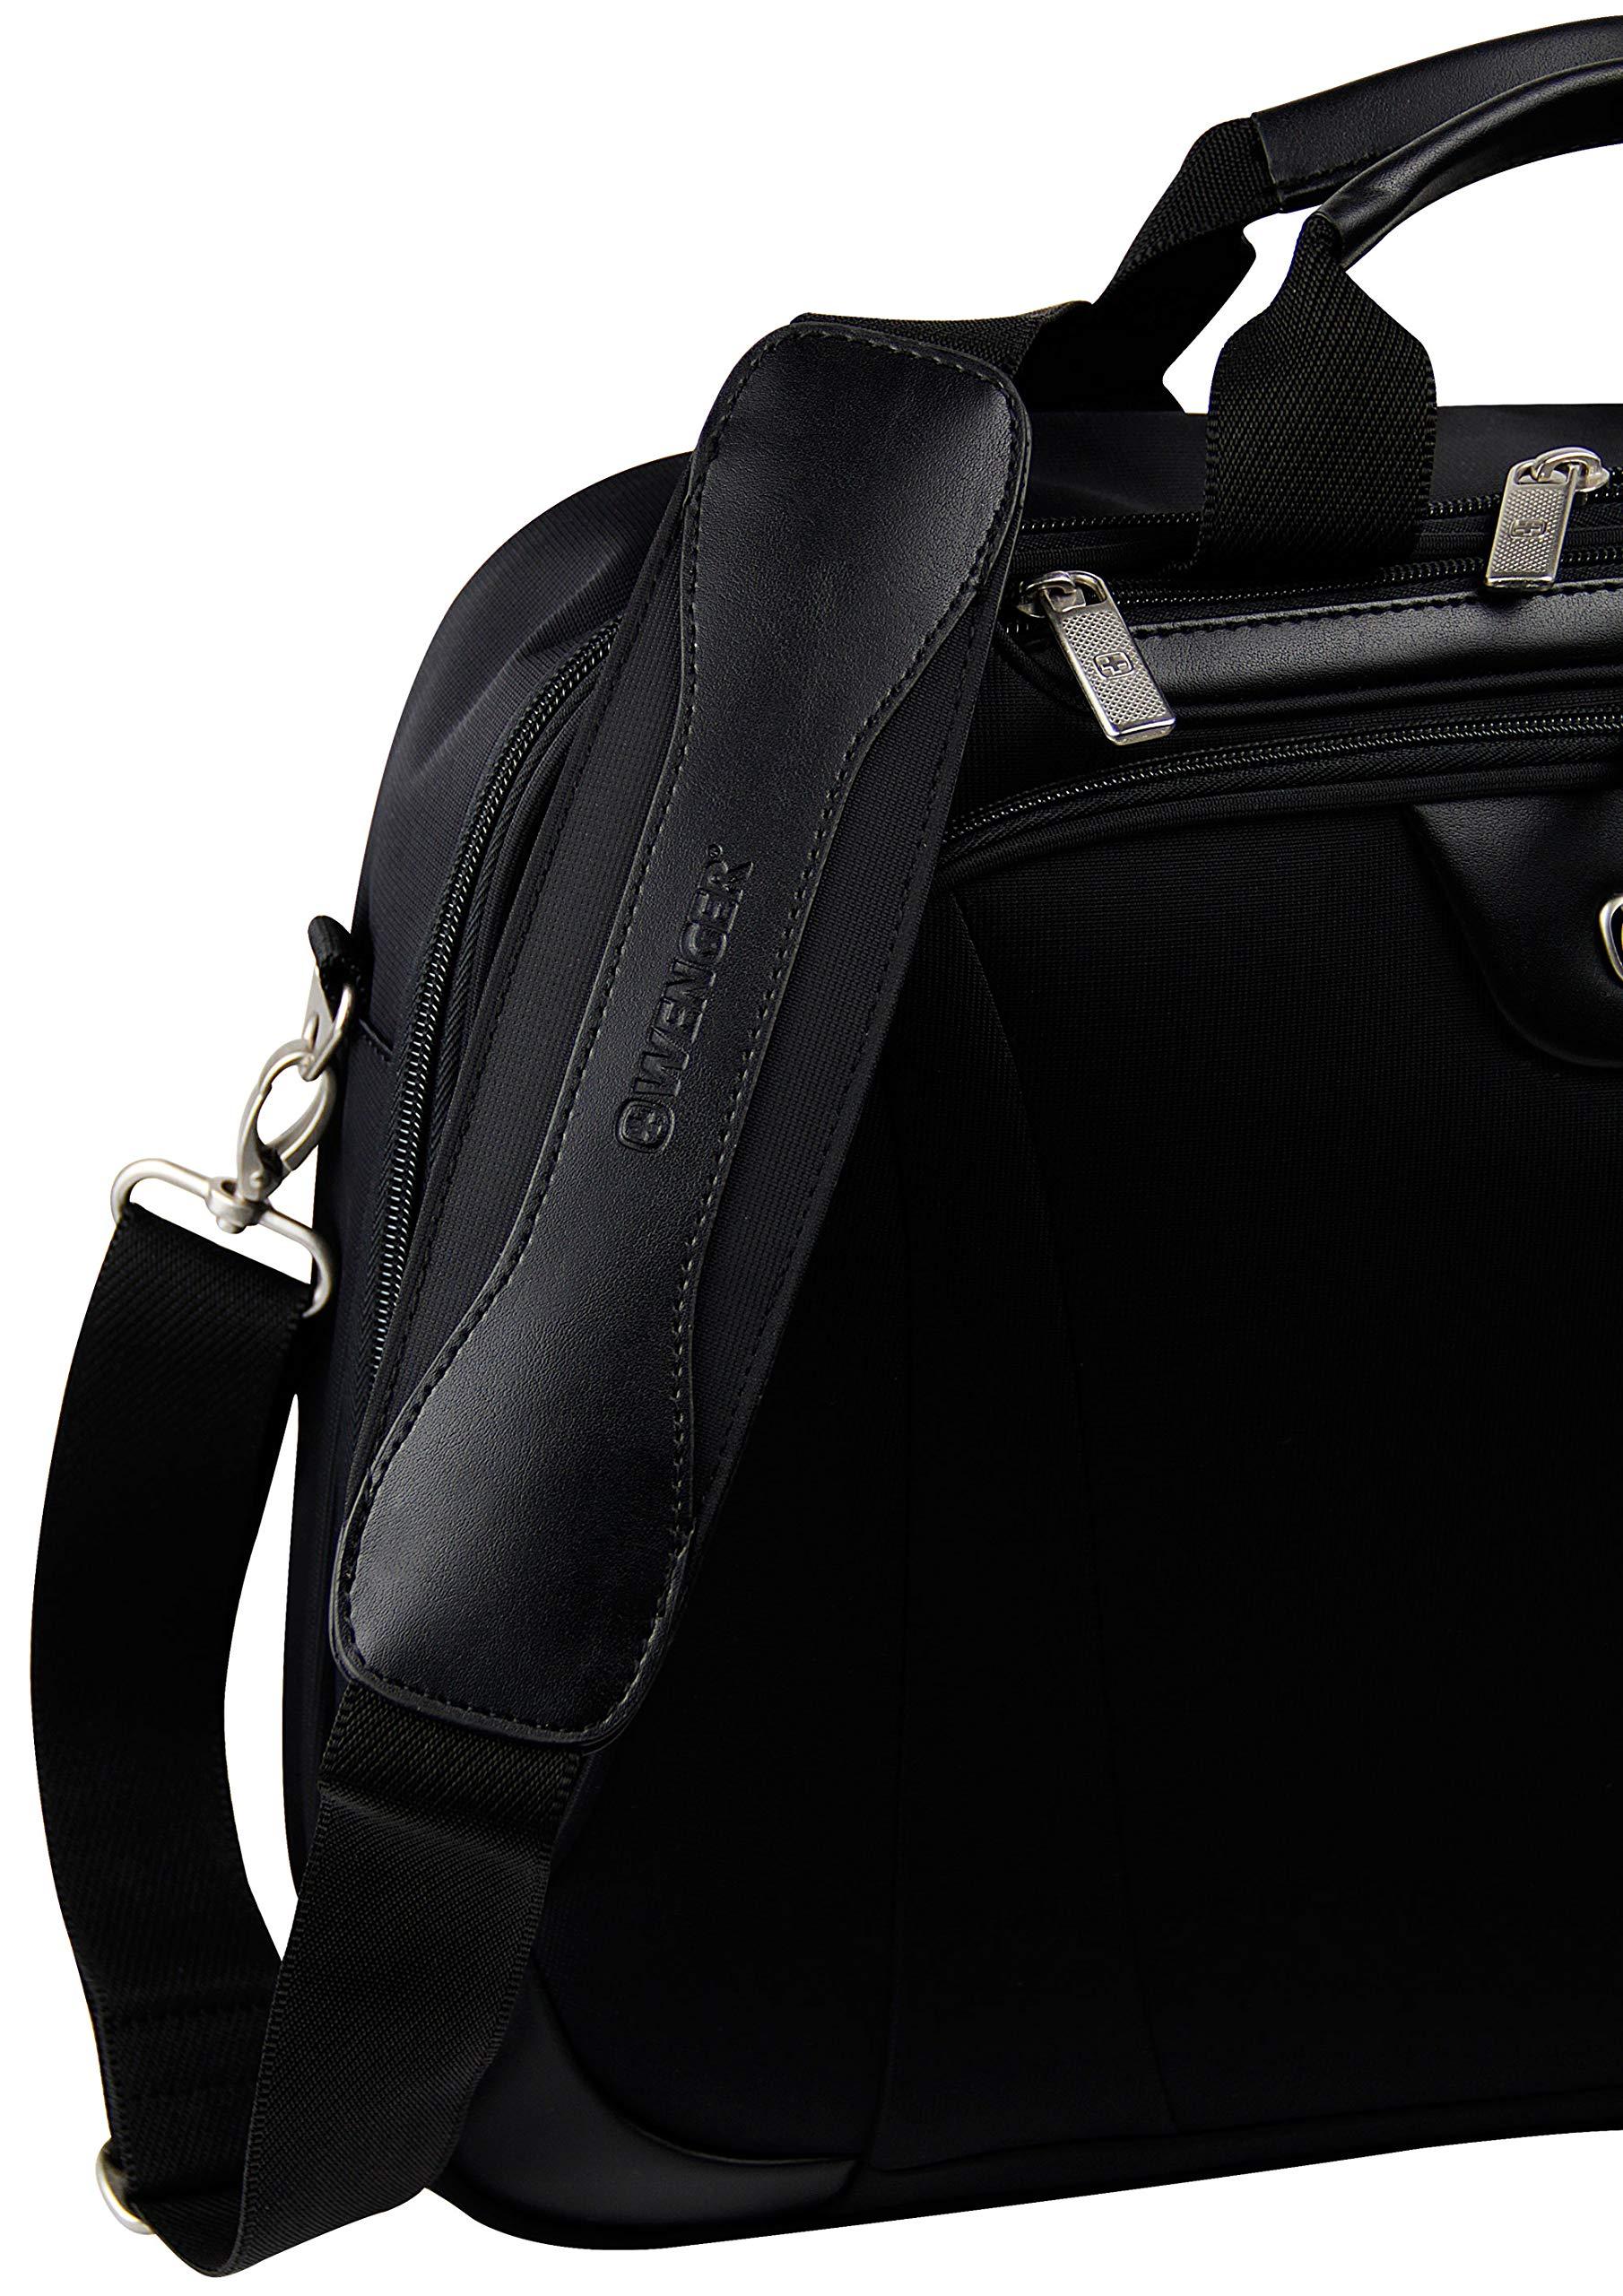 WENGER maletín maletín para portátil de hasta 17″ I maletín de Negocios para Mujeres y Hombres I Bolso Bandolera Bolso Mensajero maletín para portátil I Negro